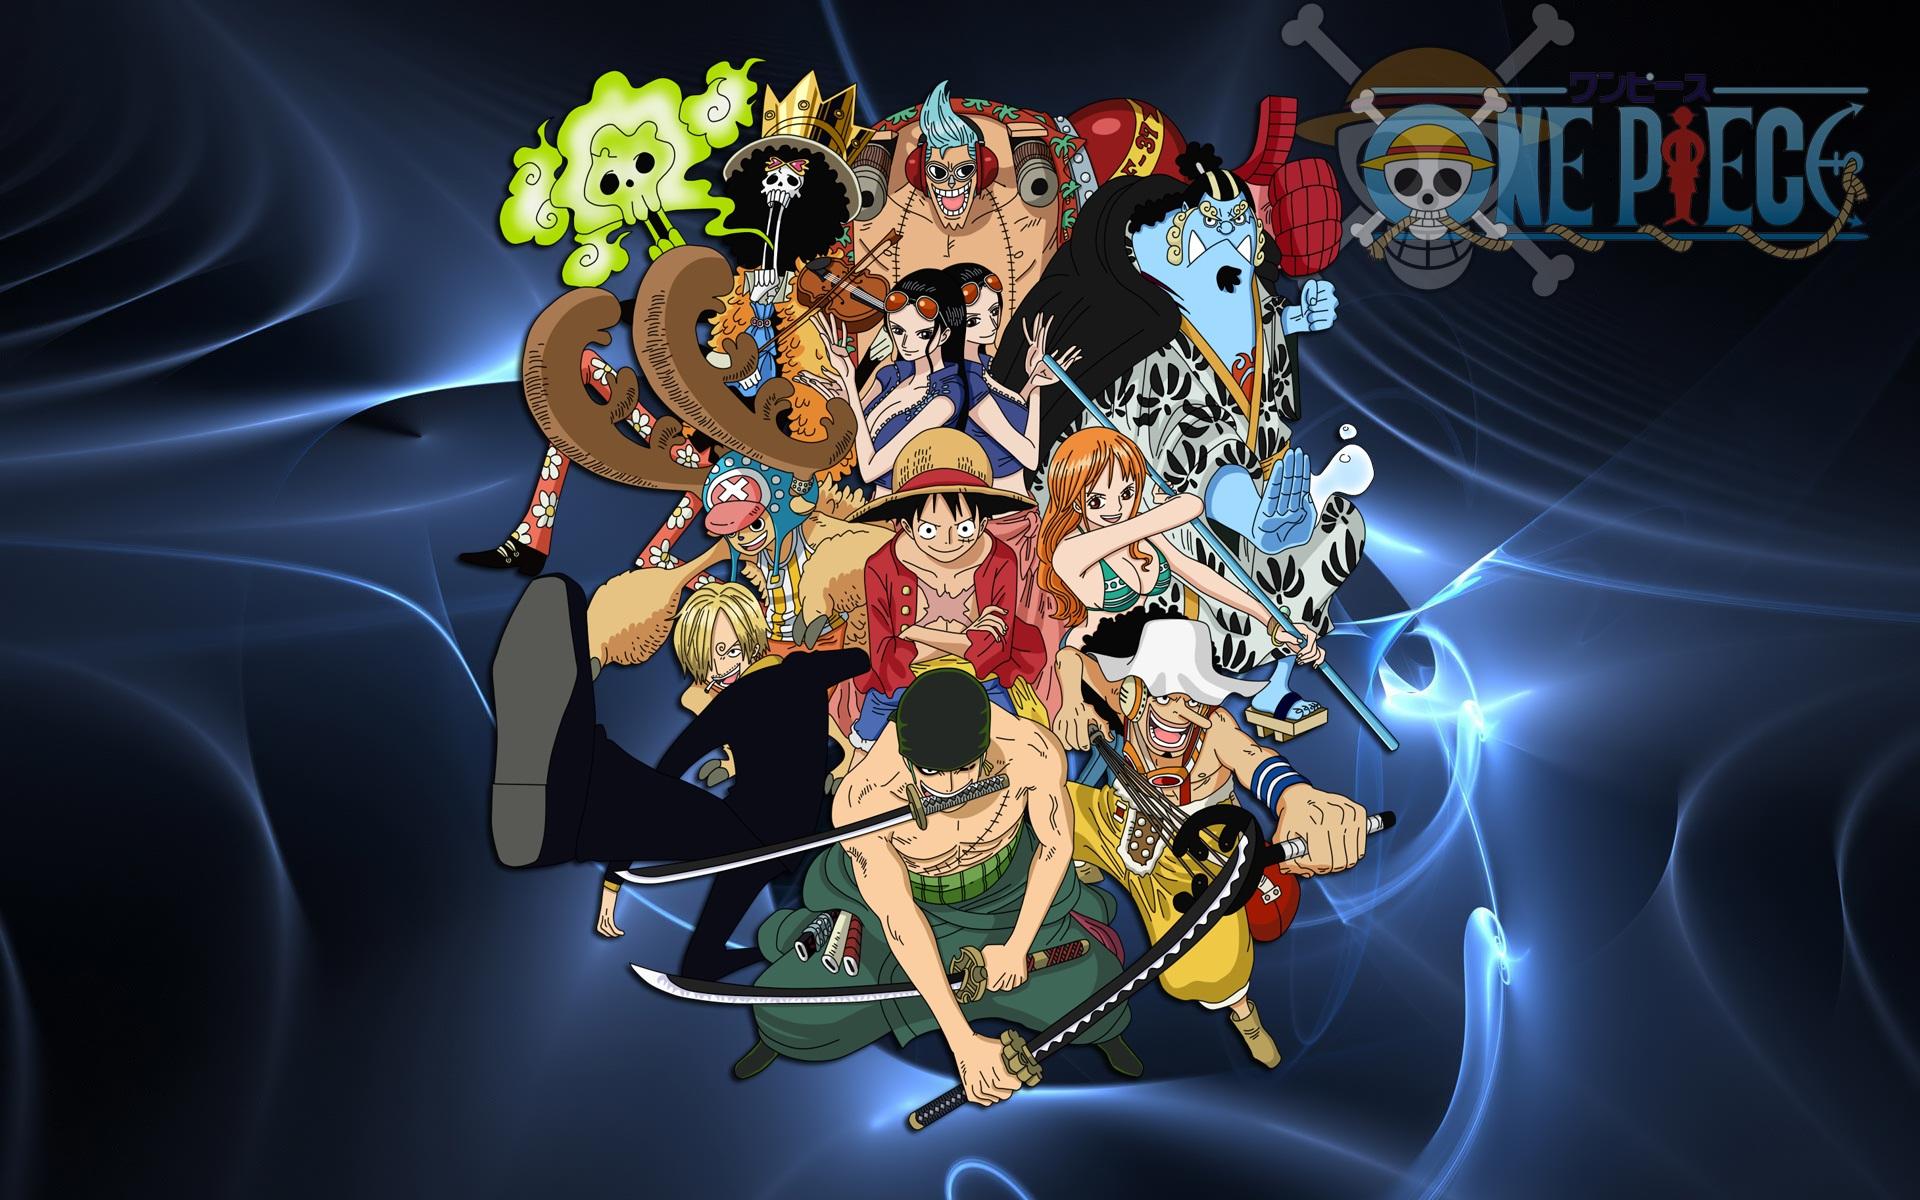 Anime One Piece 1080p 15170 Wallpaper High Resolution Wallarthdcom 1920x1200